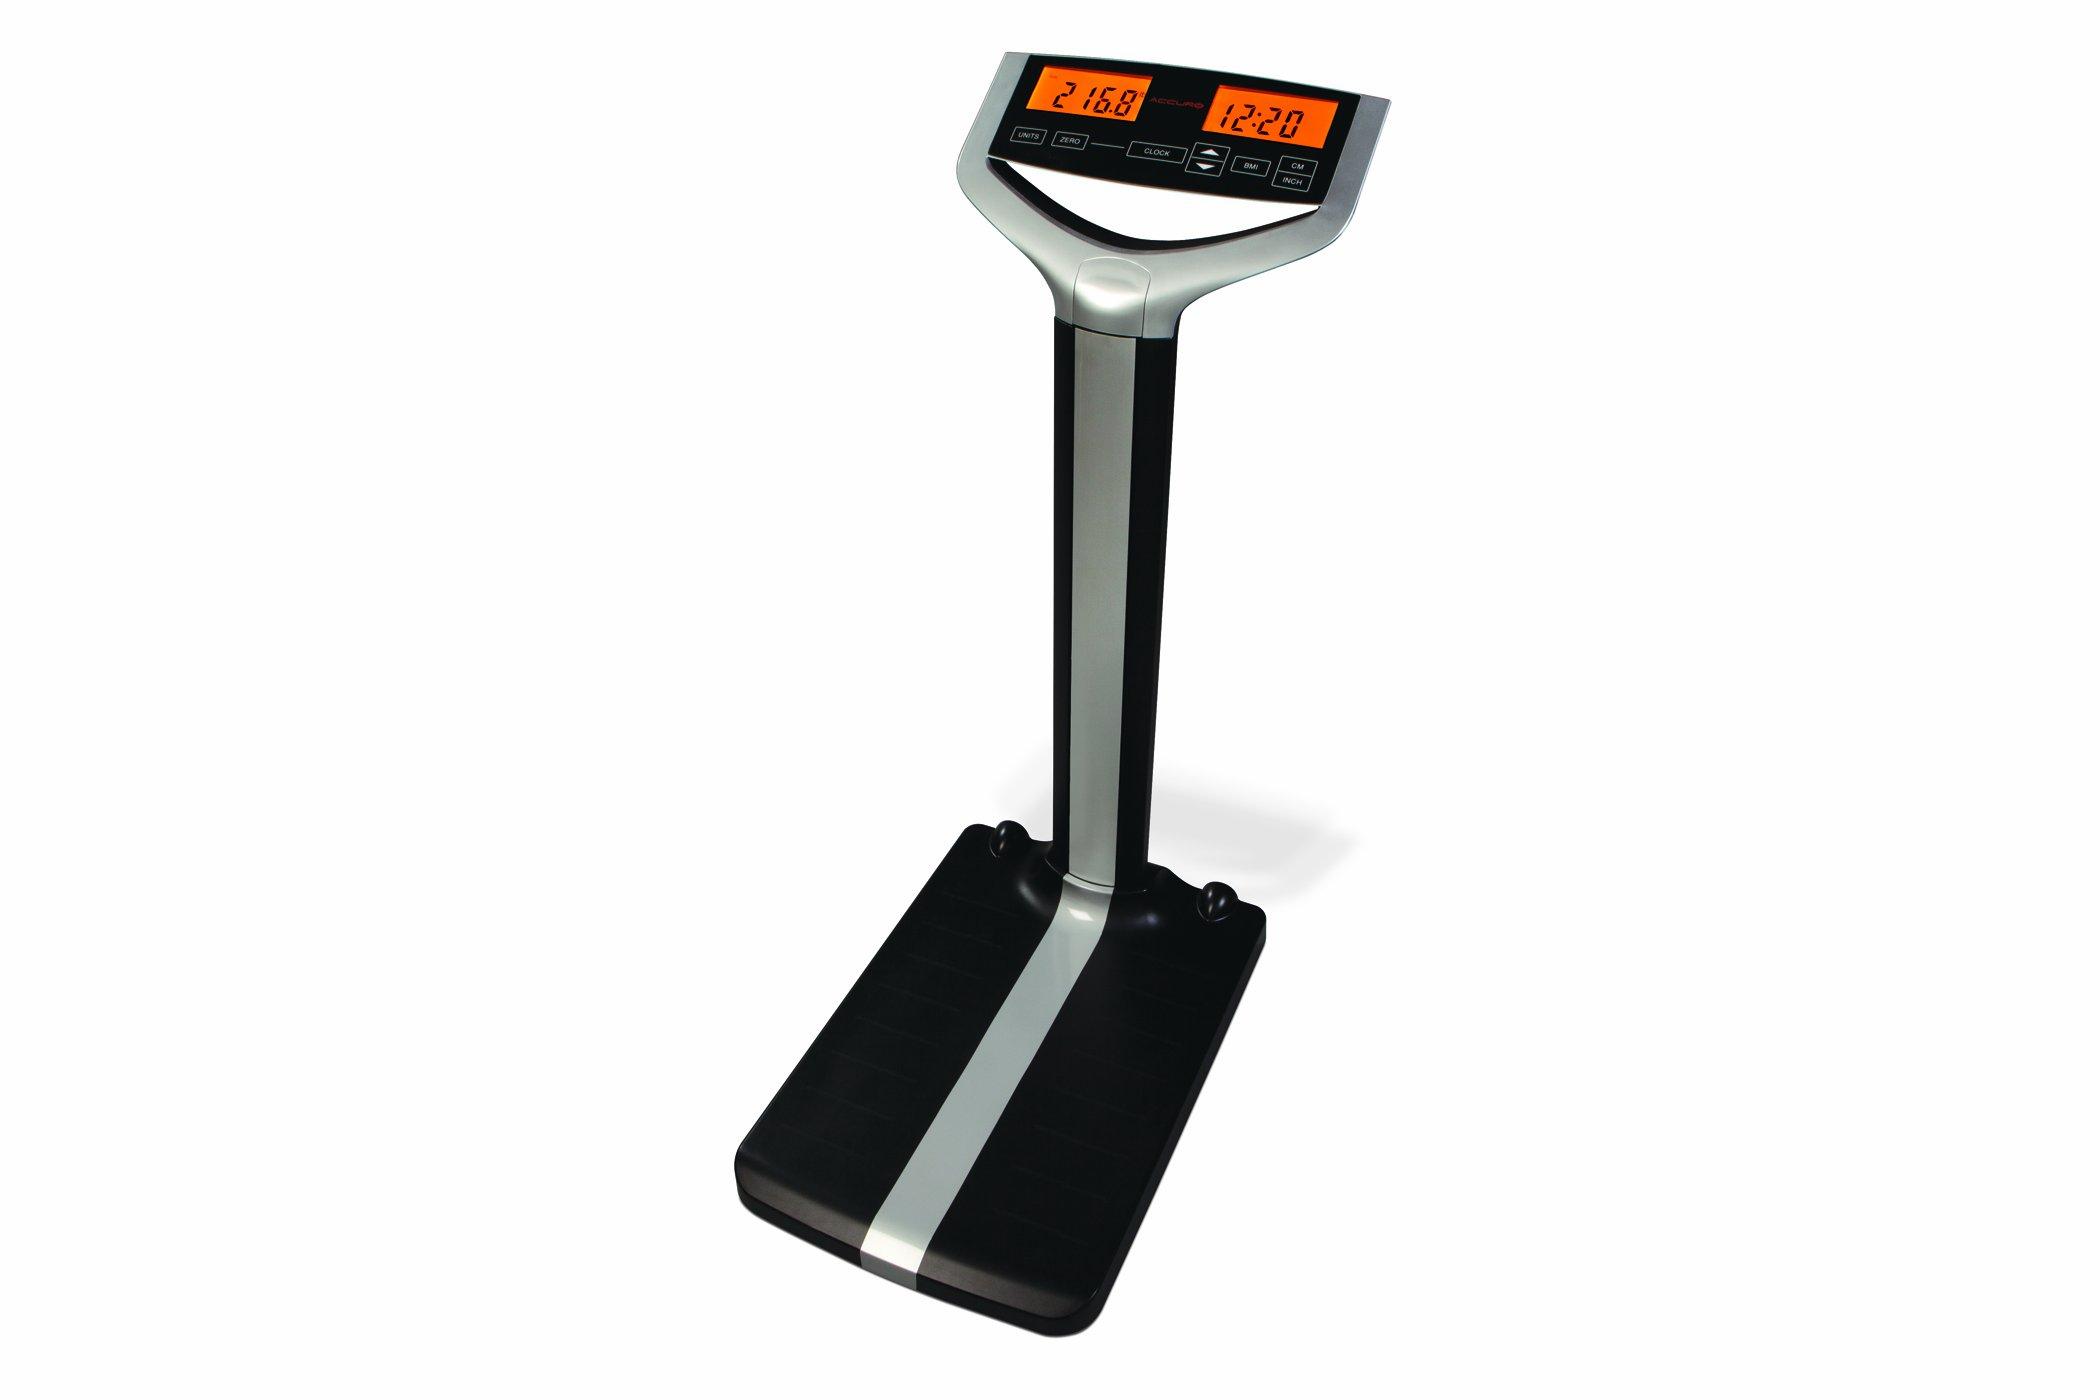 Accuro DBW100 Digital Beam Scale Waist Level